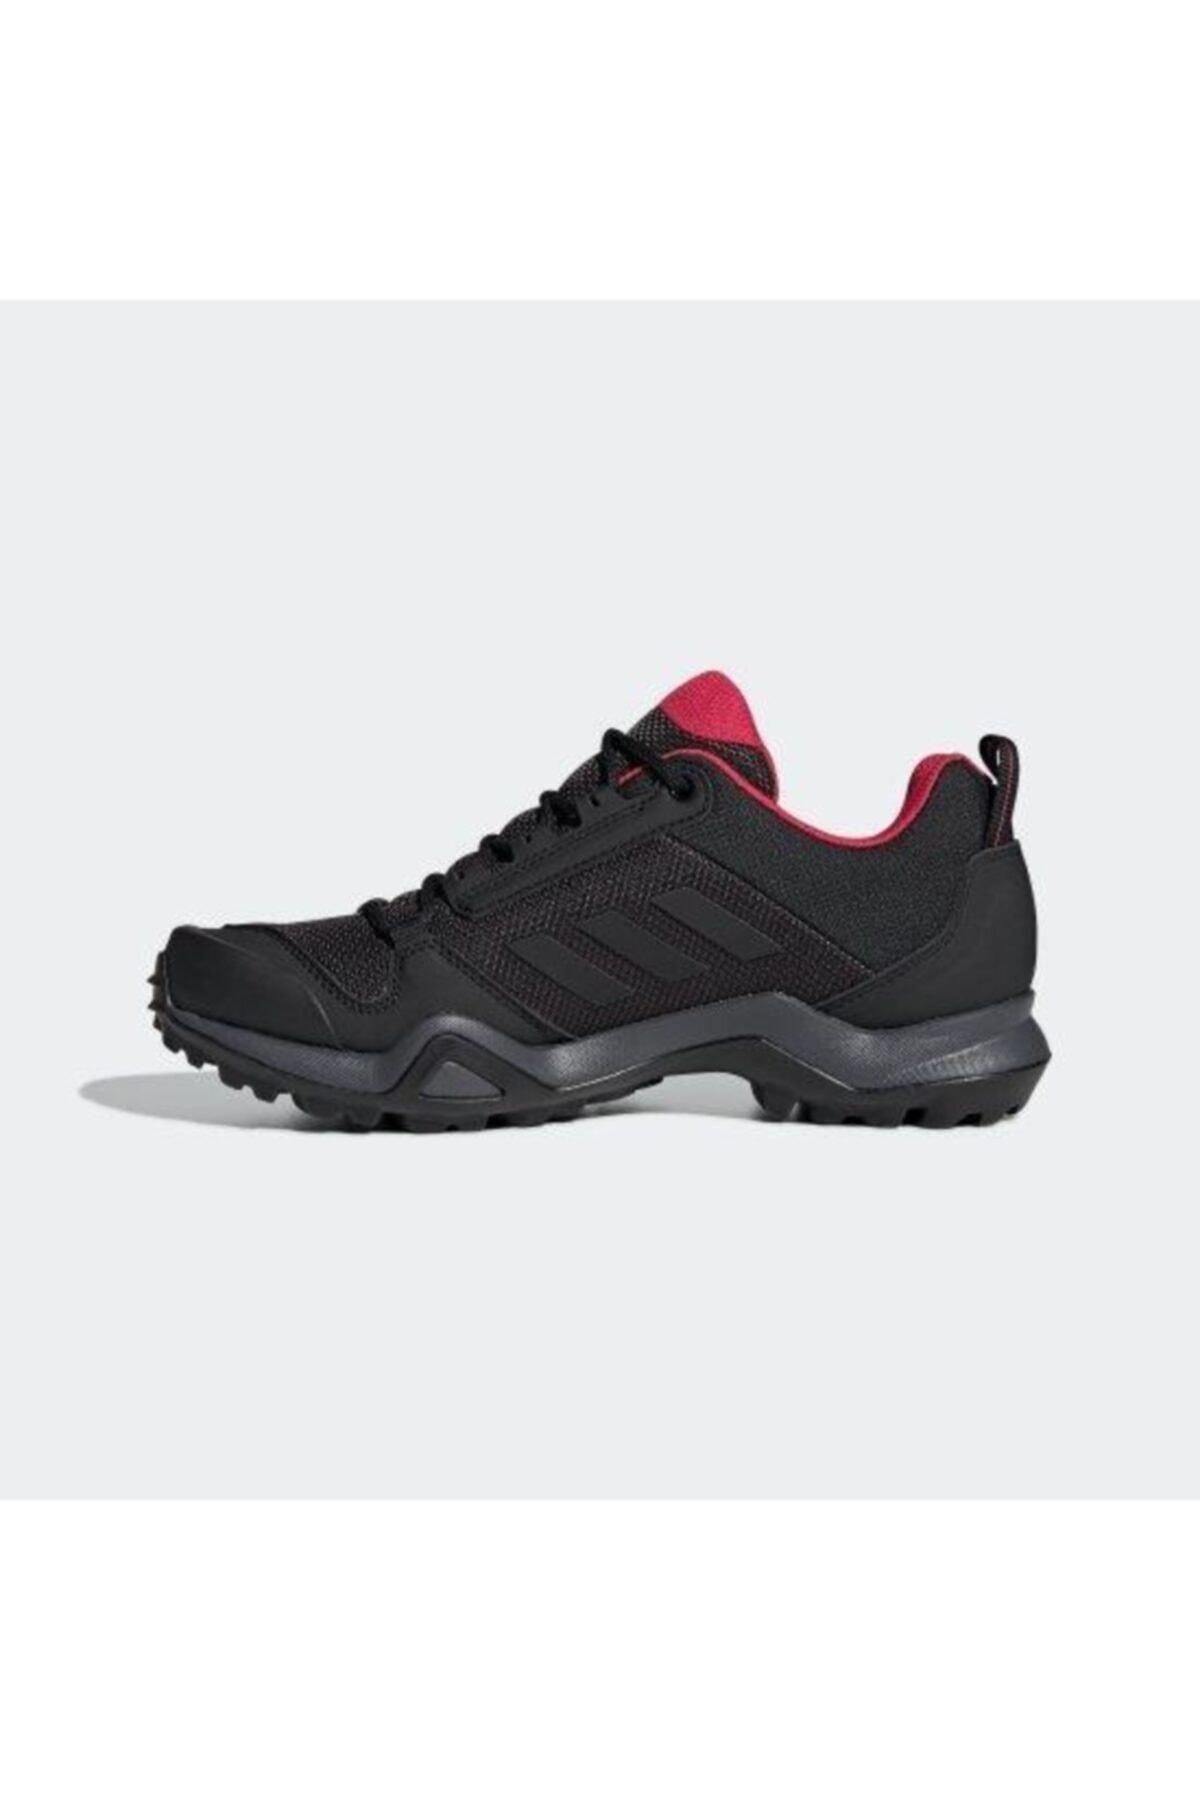 adidas Terrex Ax3 W Bb9519 Kadın Outdoor Ayakkabı 2